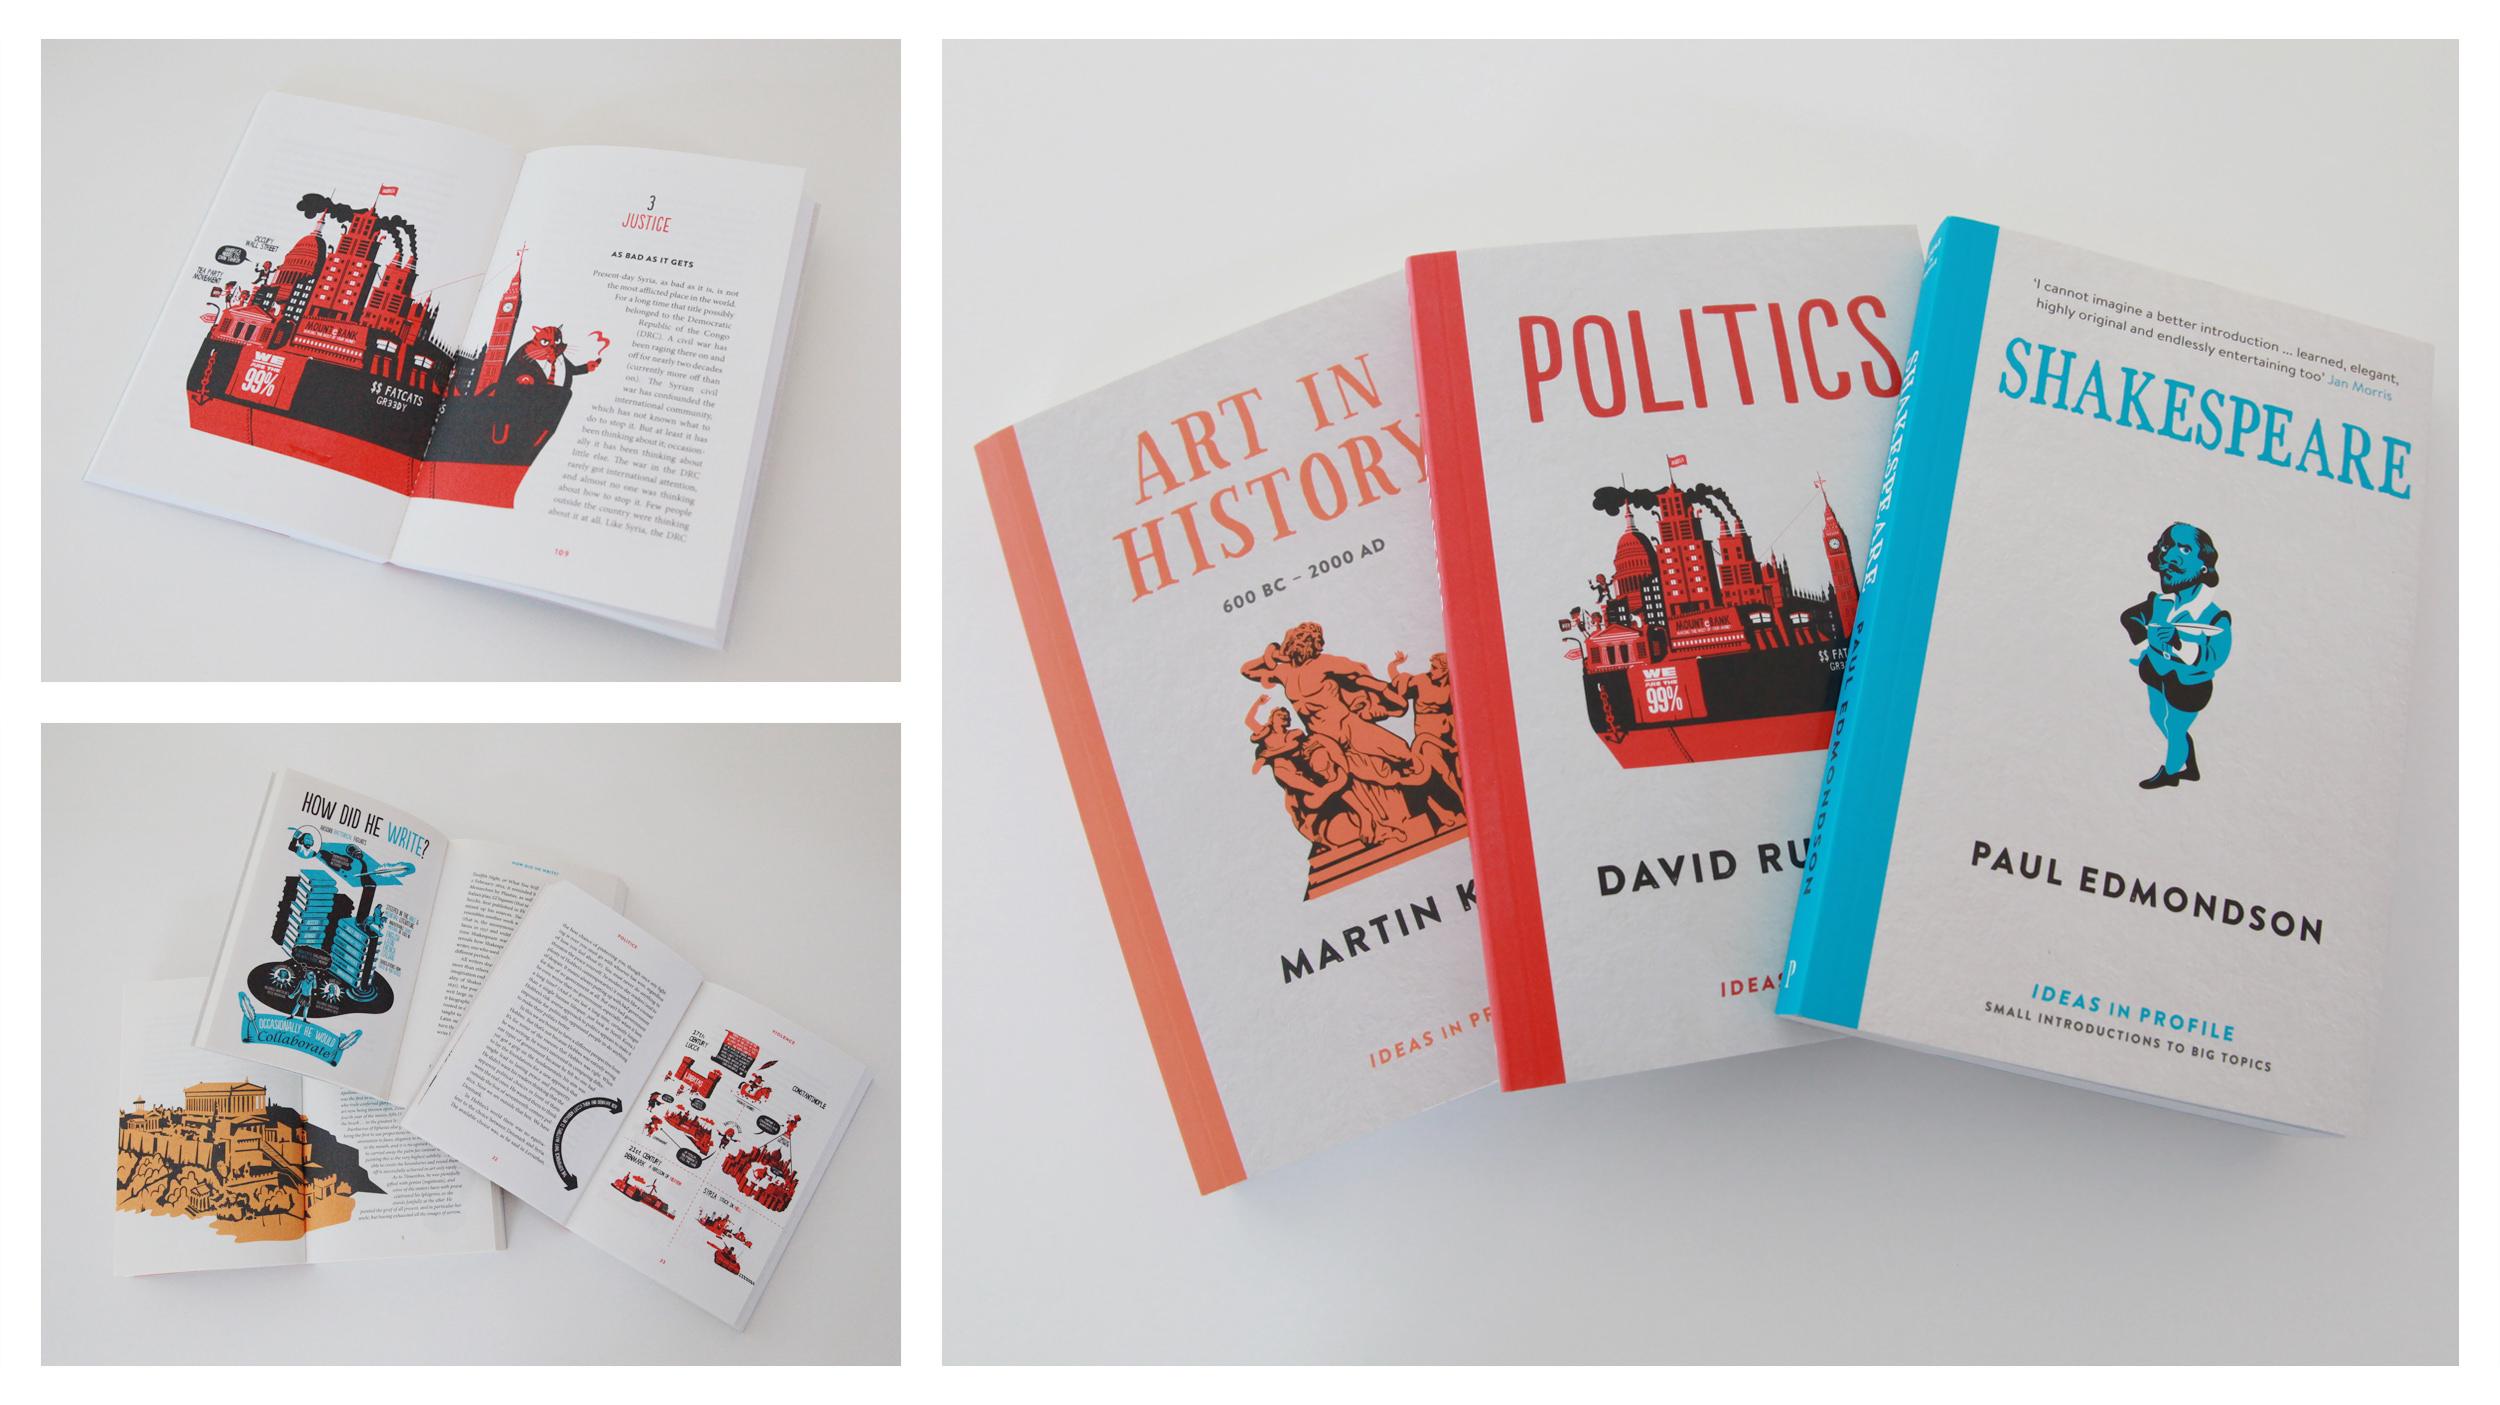 Profile-Books-Cognitive-Media-illustrations2.jpg